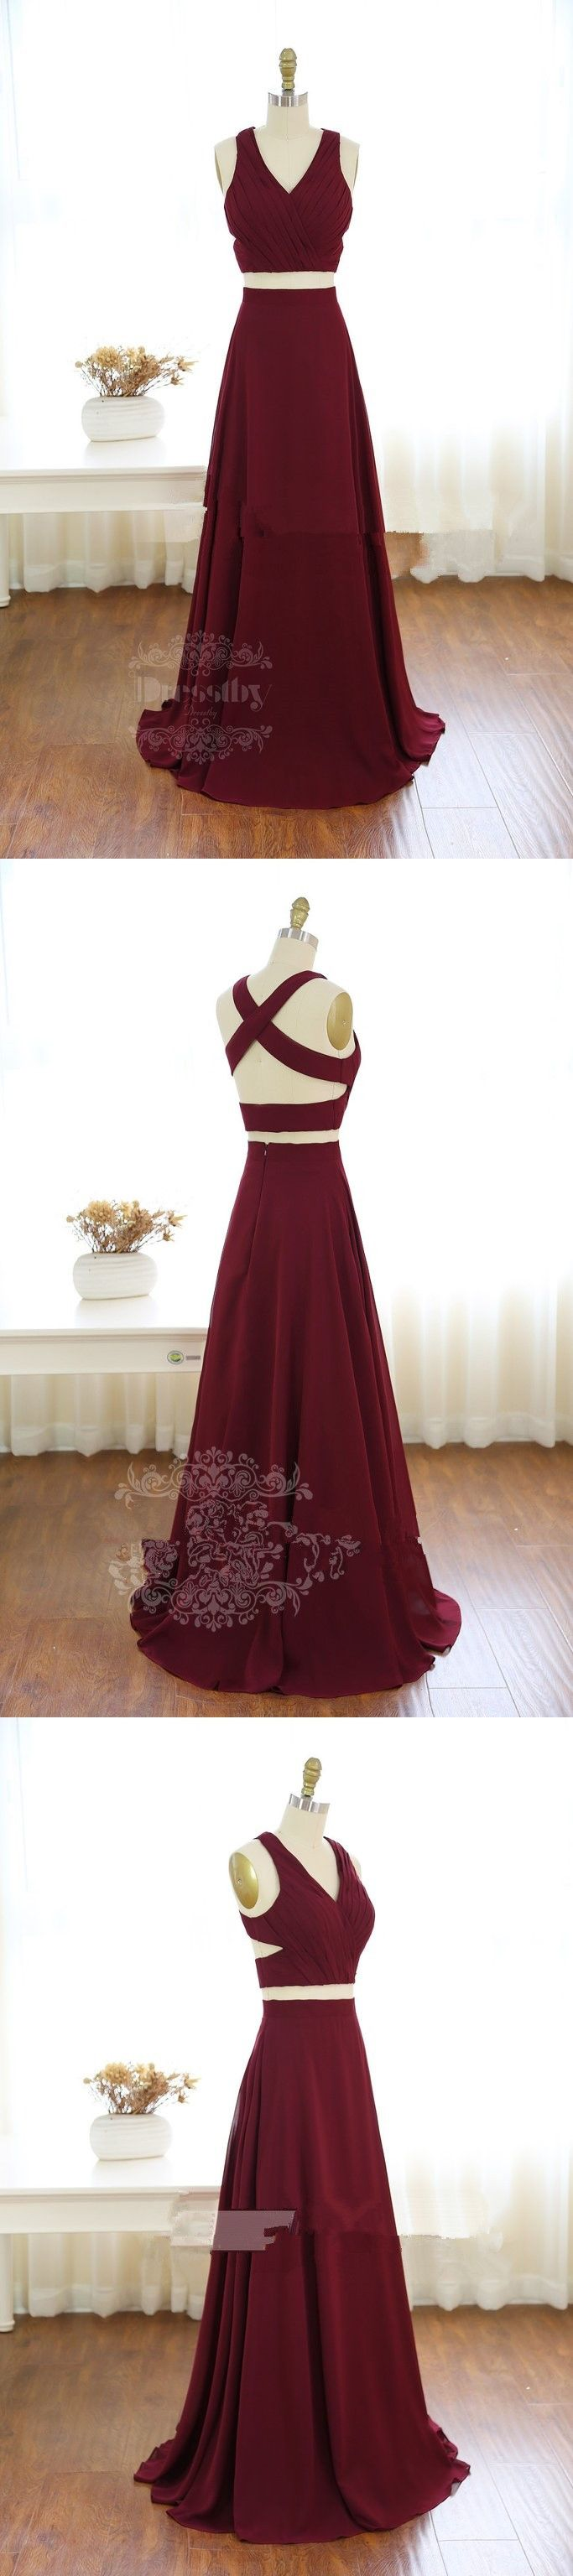 best dresses images on pinterest ball gown formal prom dresses